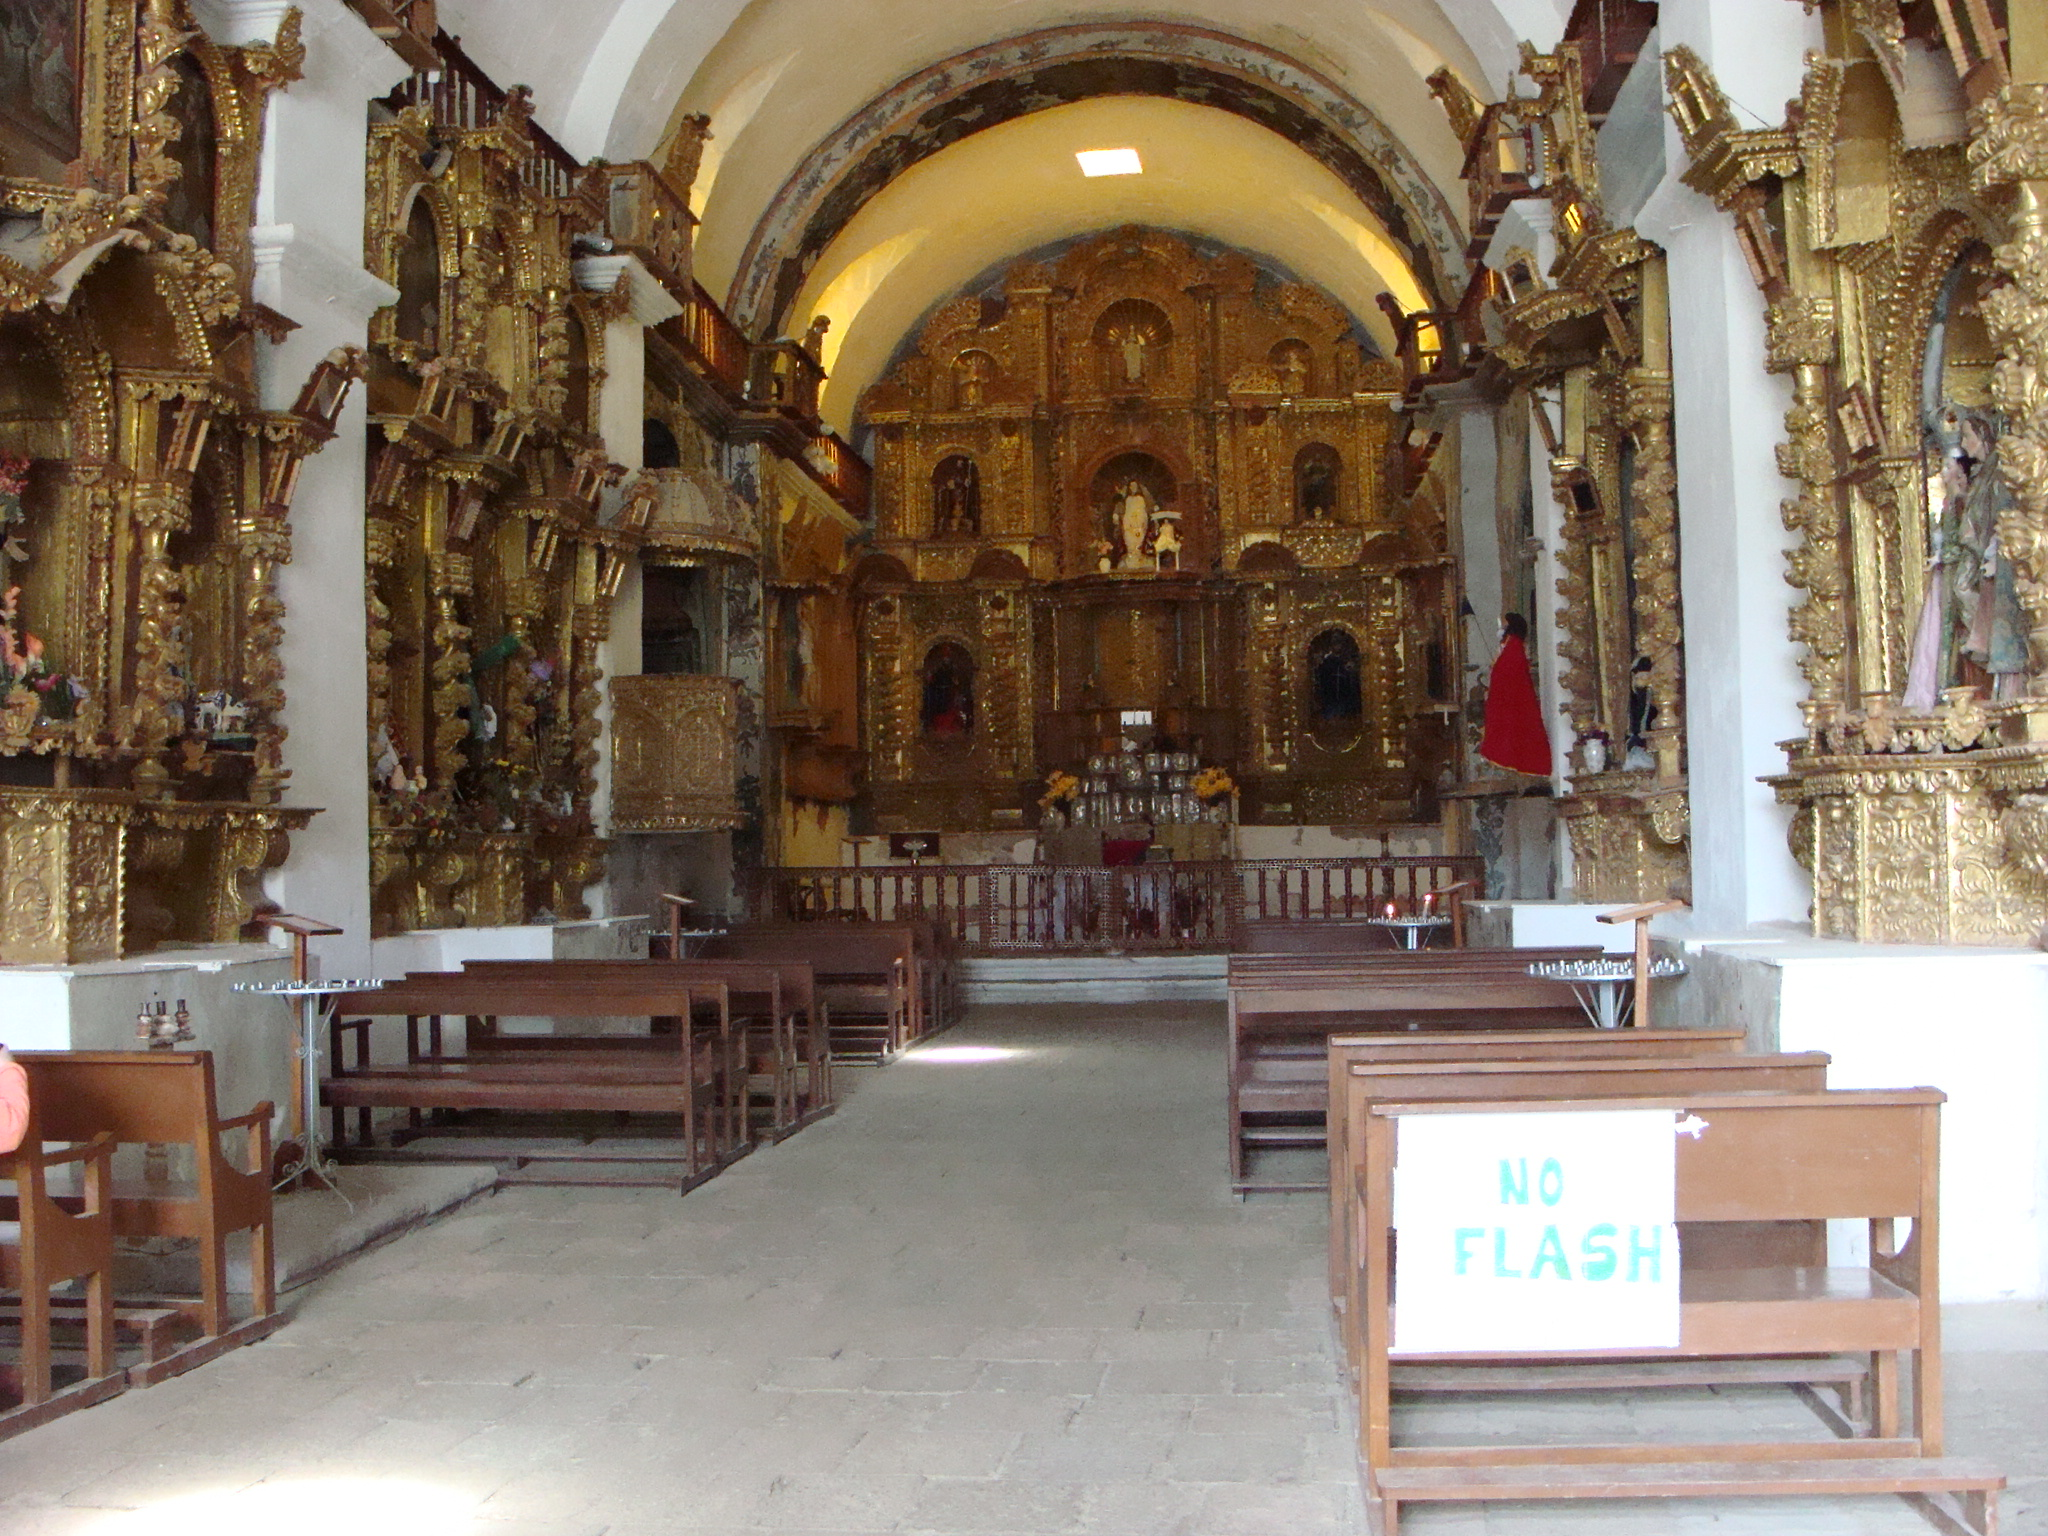 Maca - kostel Svaté Anny dne 19. 2. 2011